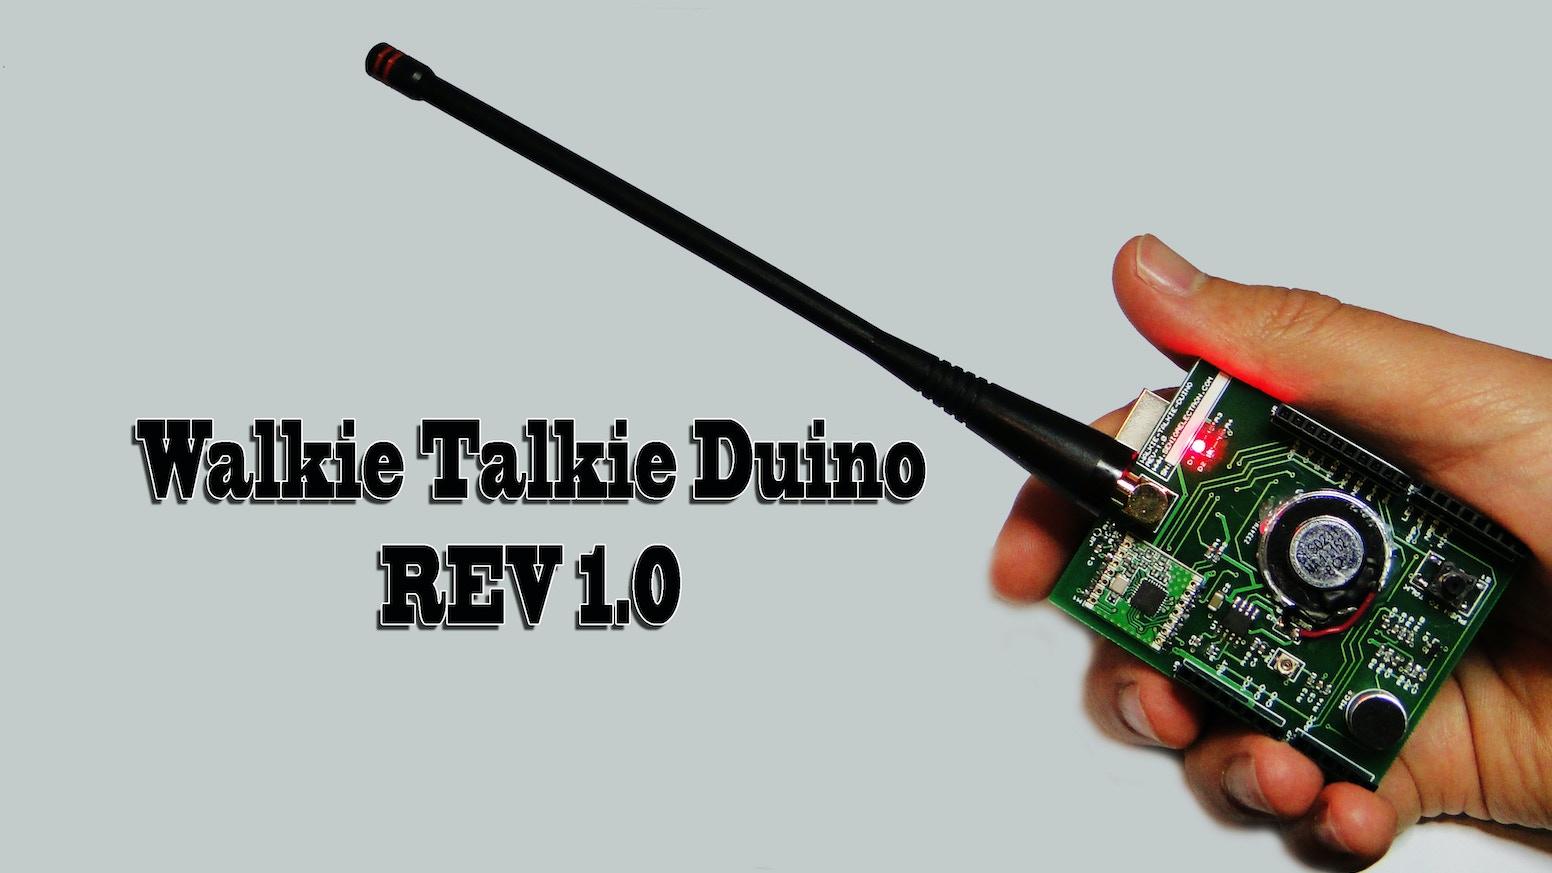 Walkie Talkie Duino by MASIH VAHIDA — Kickstarter